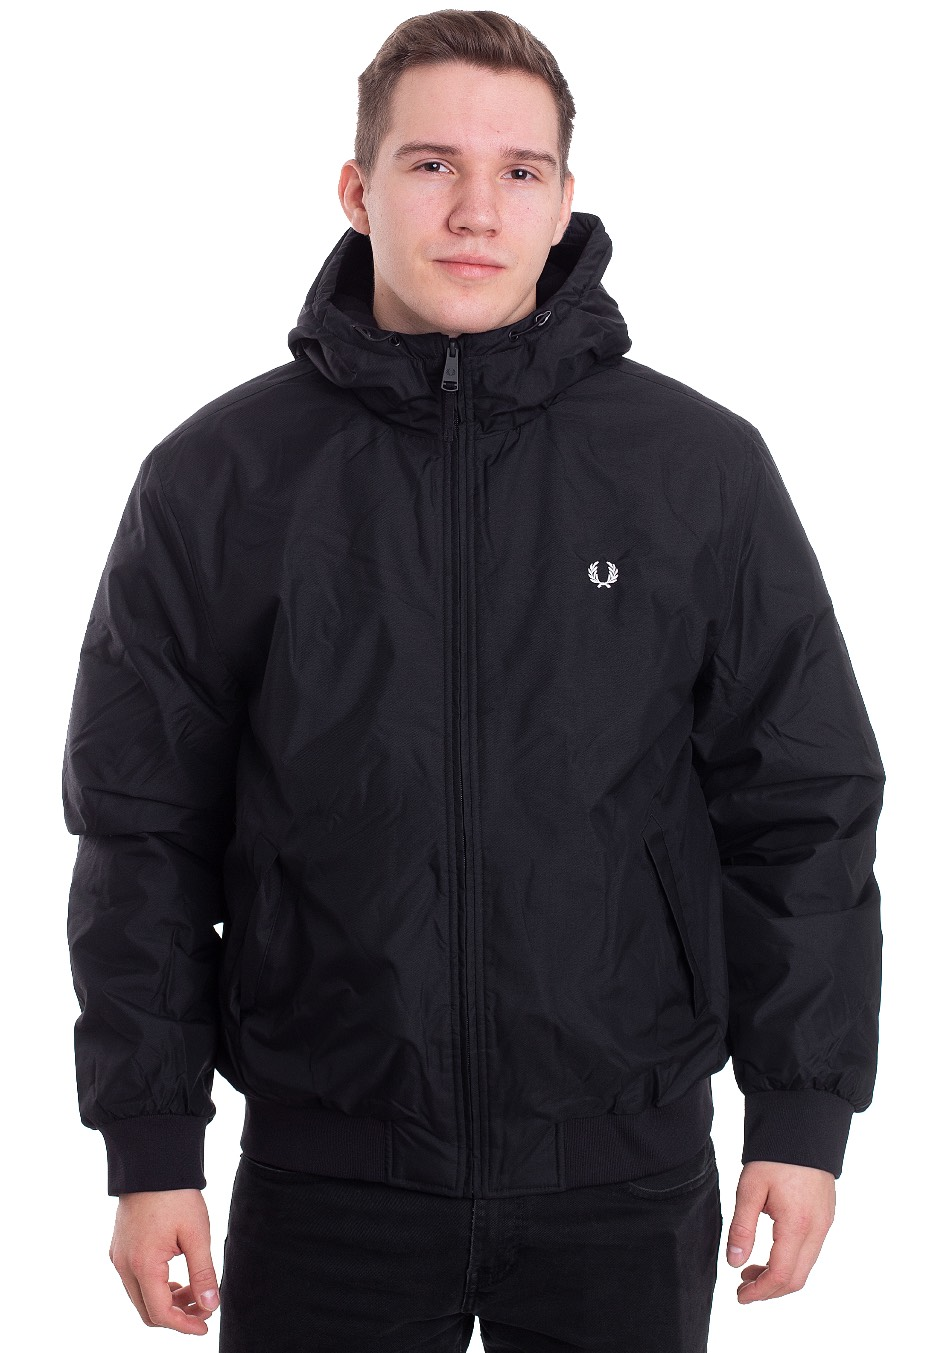 fred perry hooded brentham jacke mit kapuze schwarz